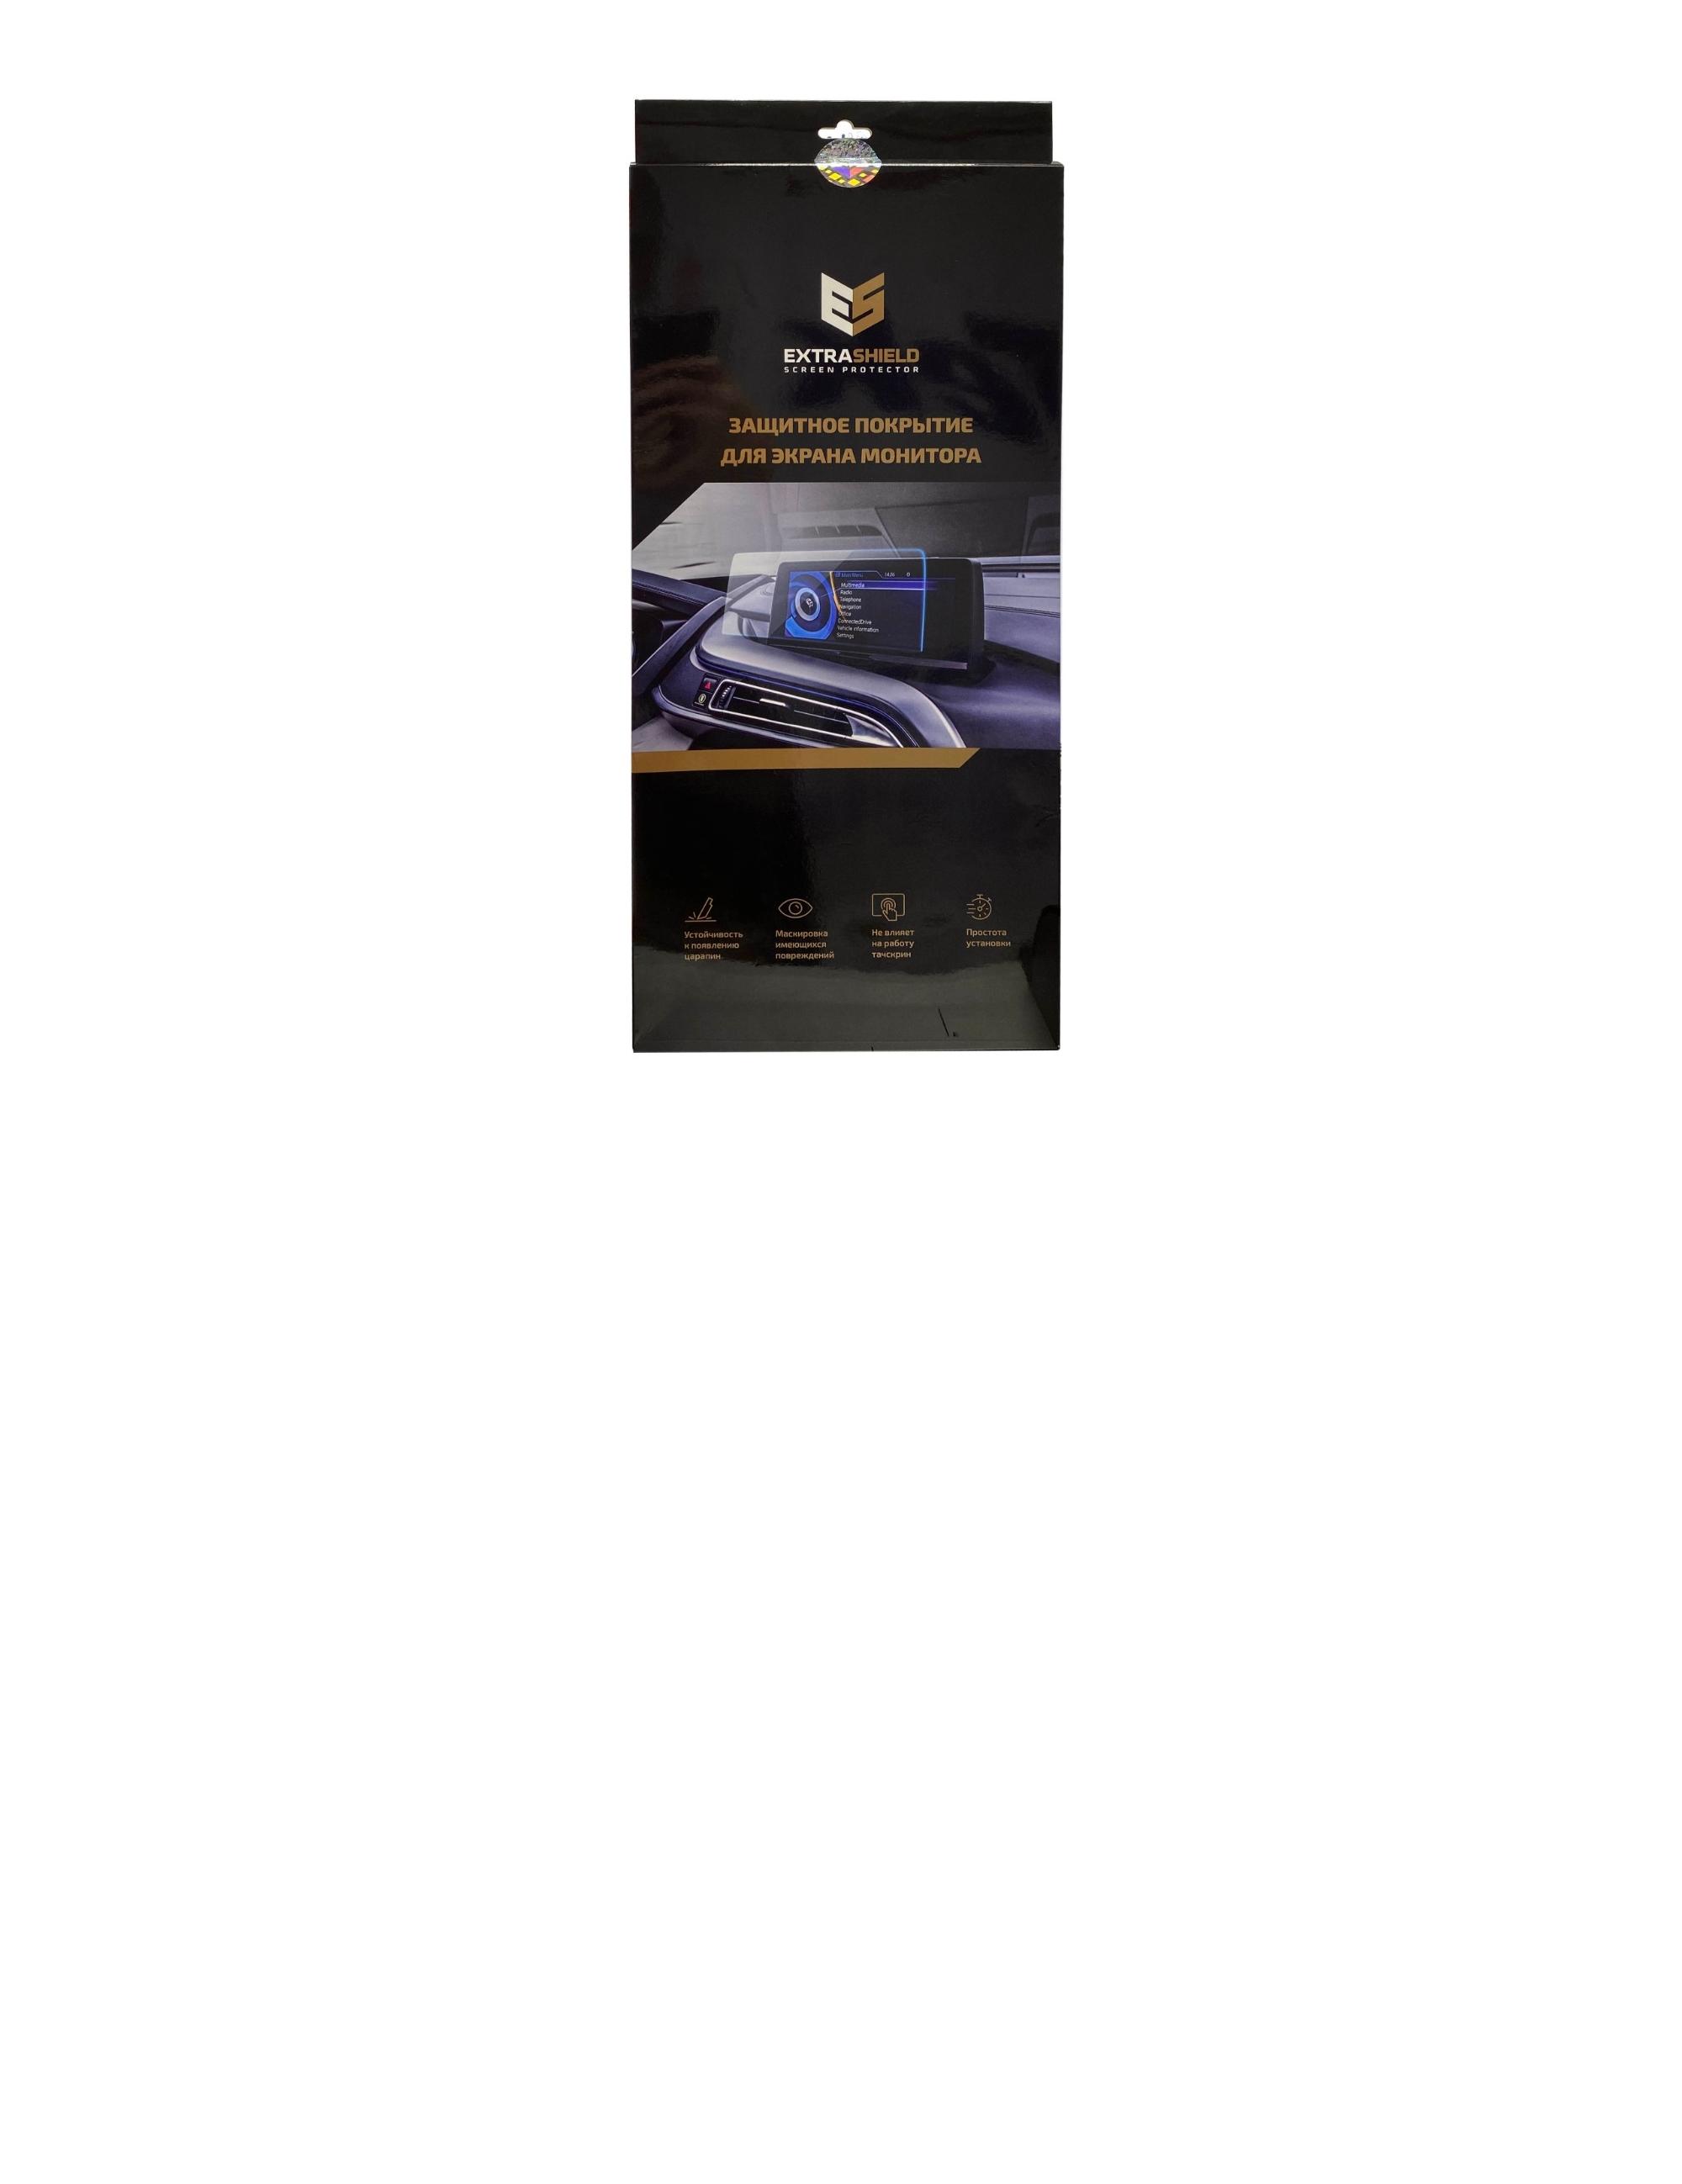 Mercedes-Benz GLC (X253) дорестайлинг 2015 - 2019 мультимедиа 7 Защитное стекло Глянец